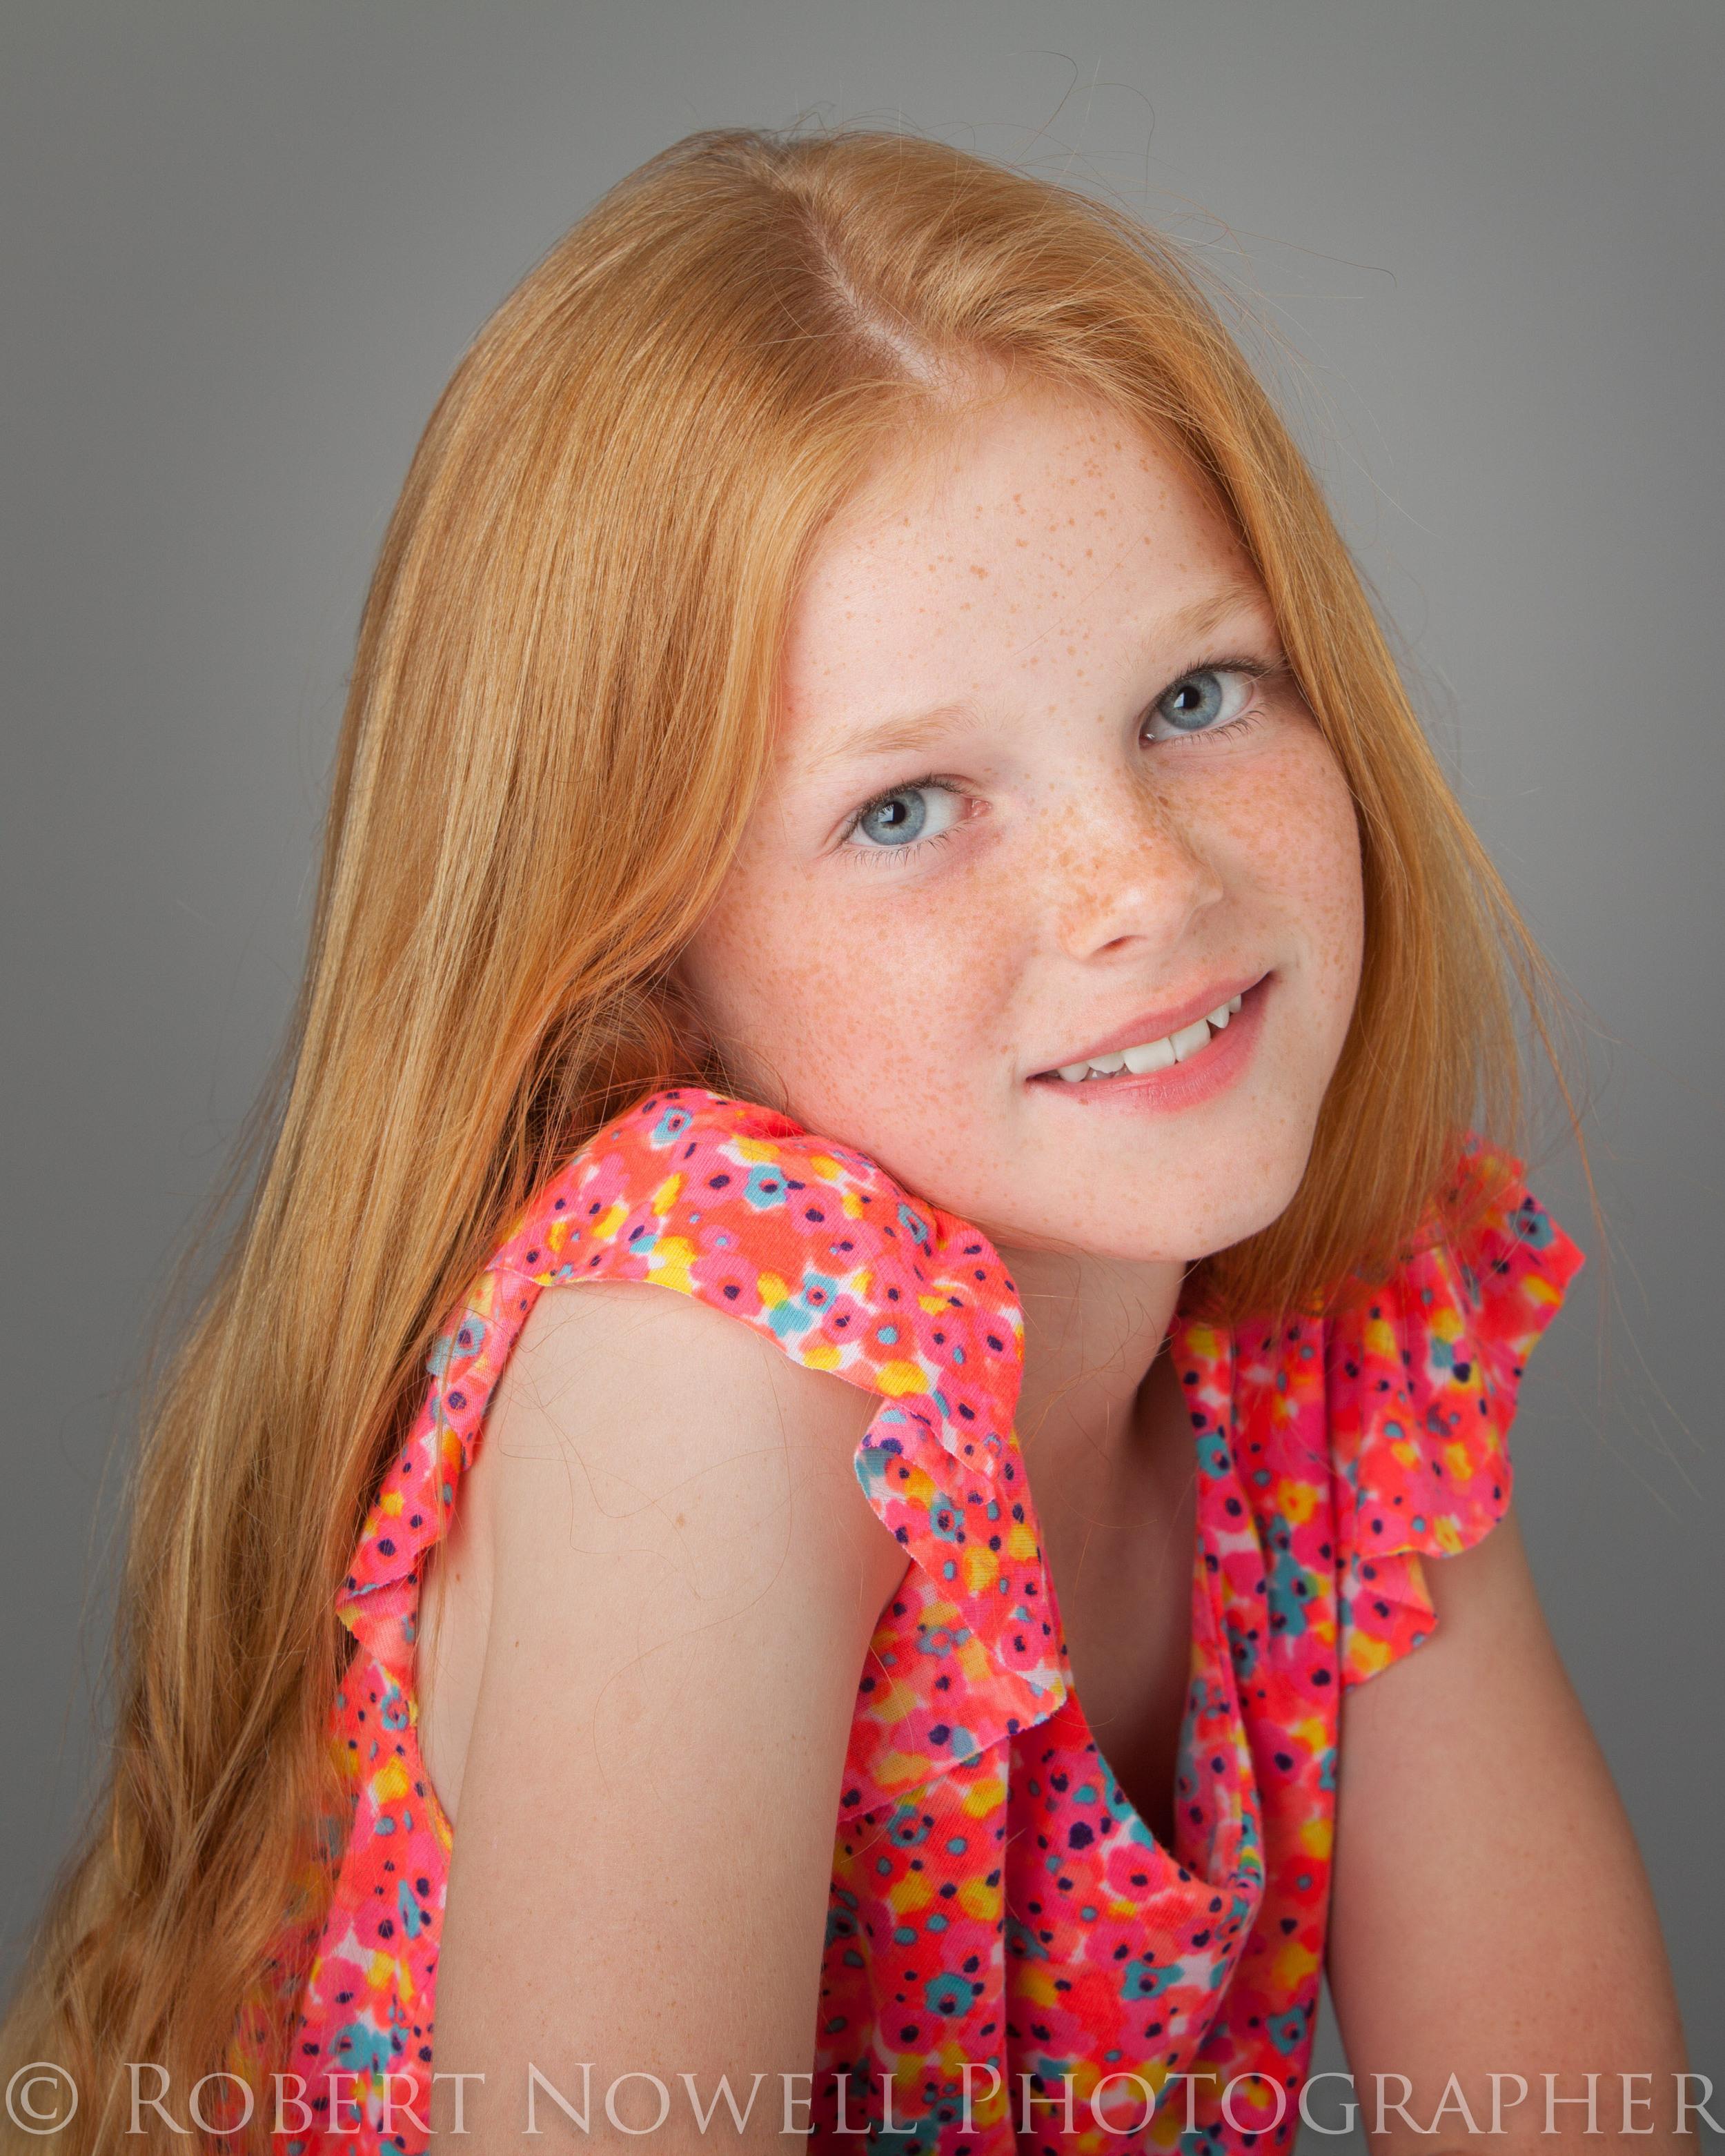 Avery Tgp Senior Model